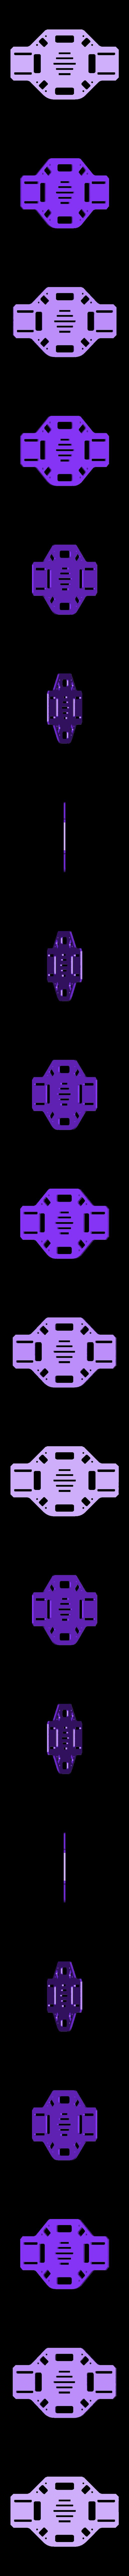 F450_Syma_X8_Bottom_Plate_v2.stl Download free STL file Syma X8 Re-imagined as a Fire Wheel 450! • 3D printing model, DIY3DTech